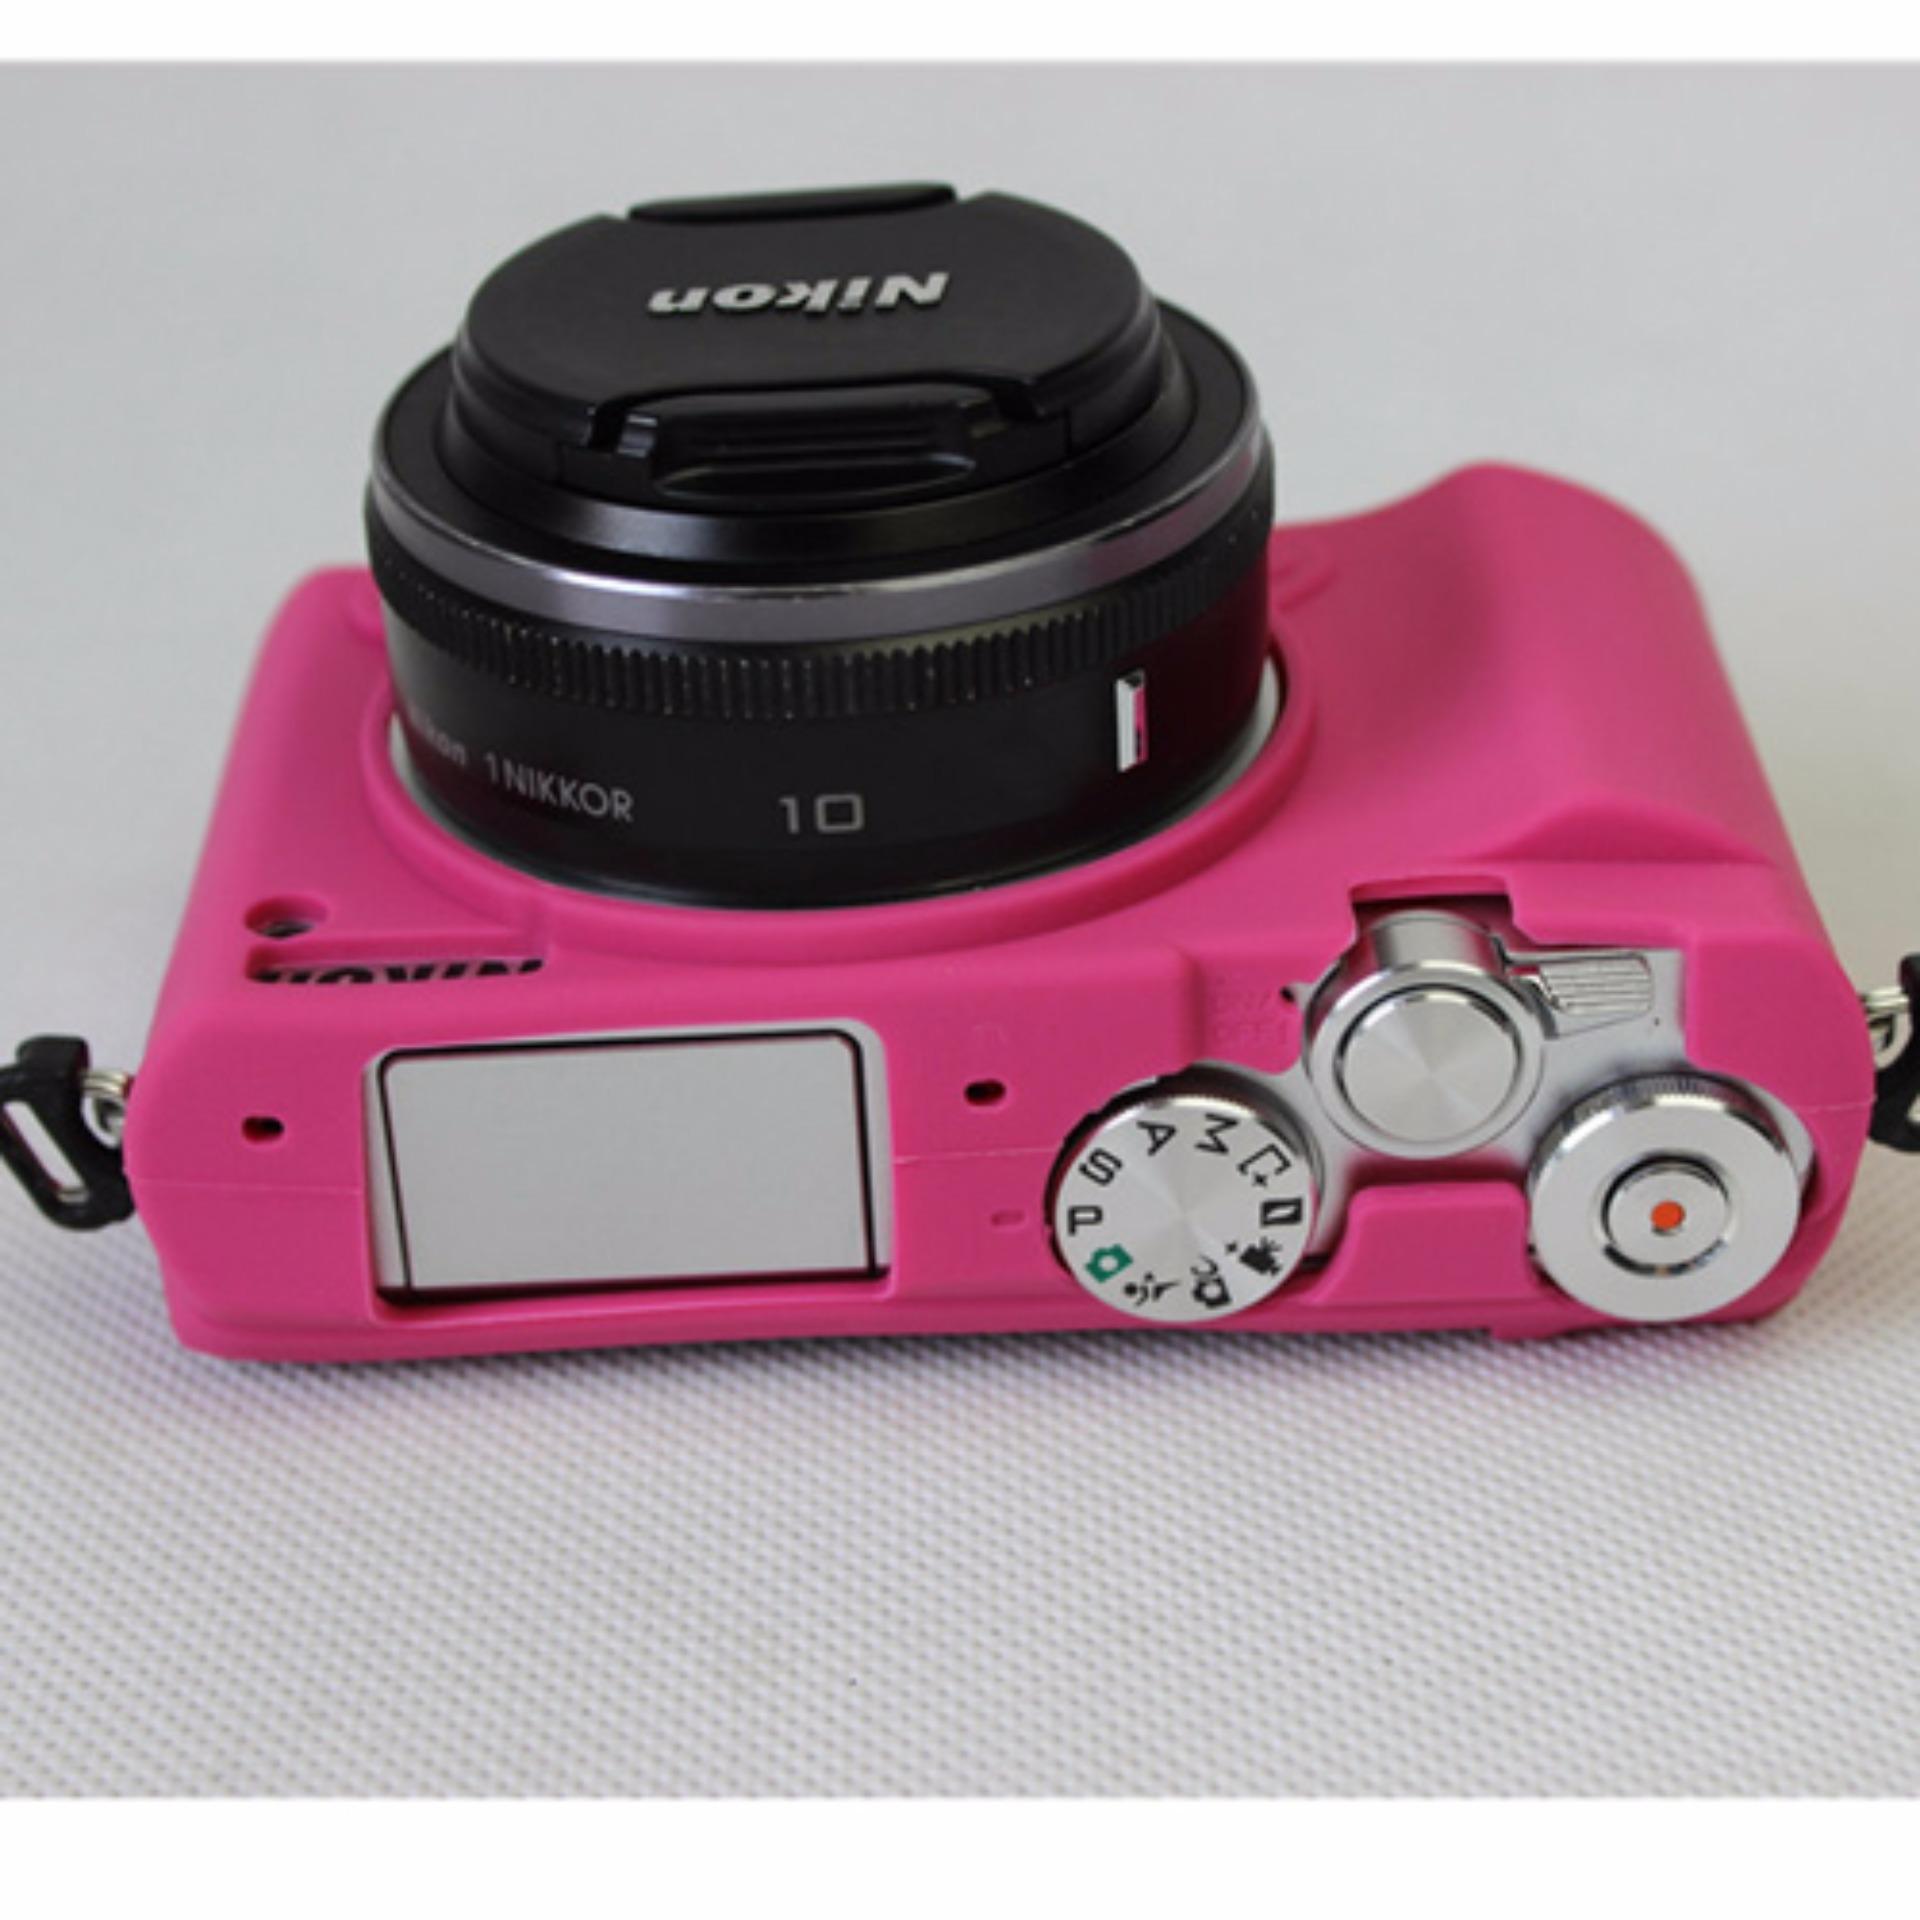 Rajawali Silicone Case For Nikon J5 - Brown/Coklat ...